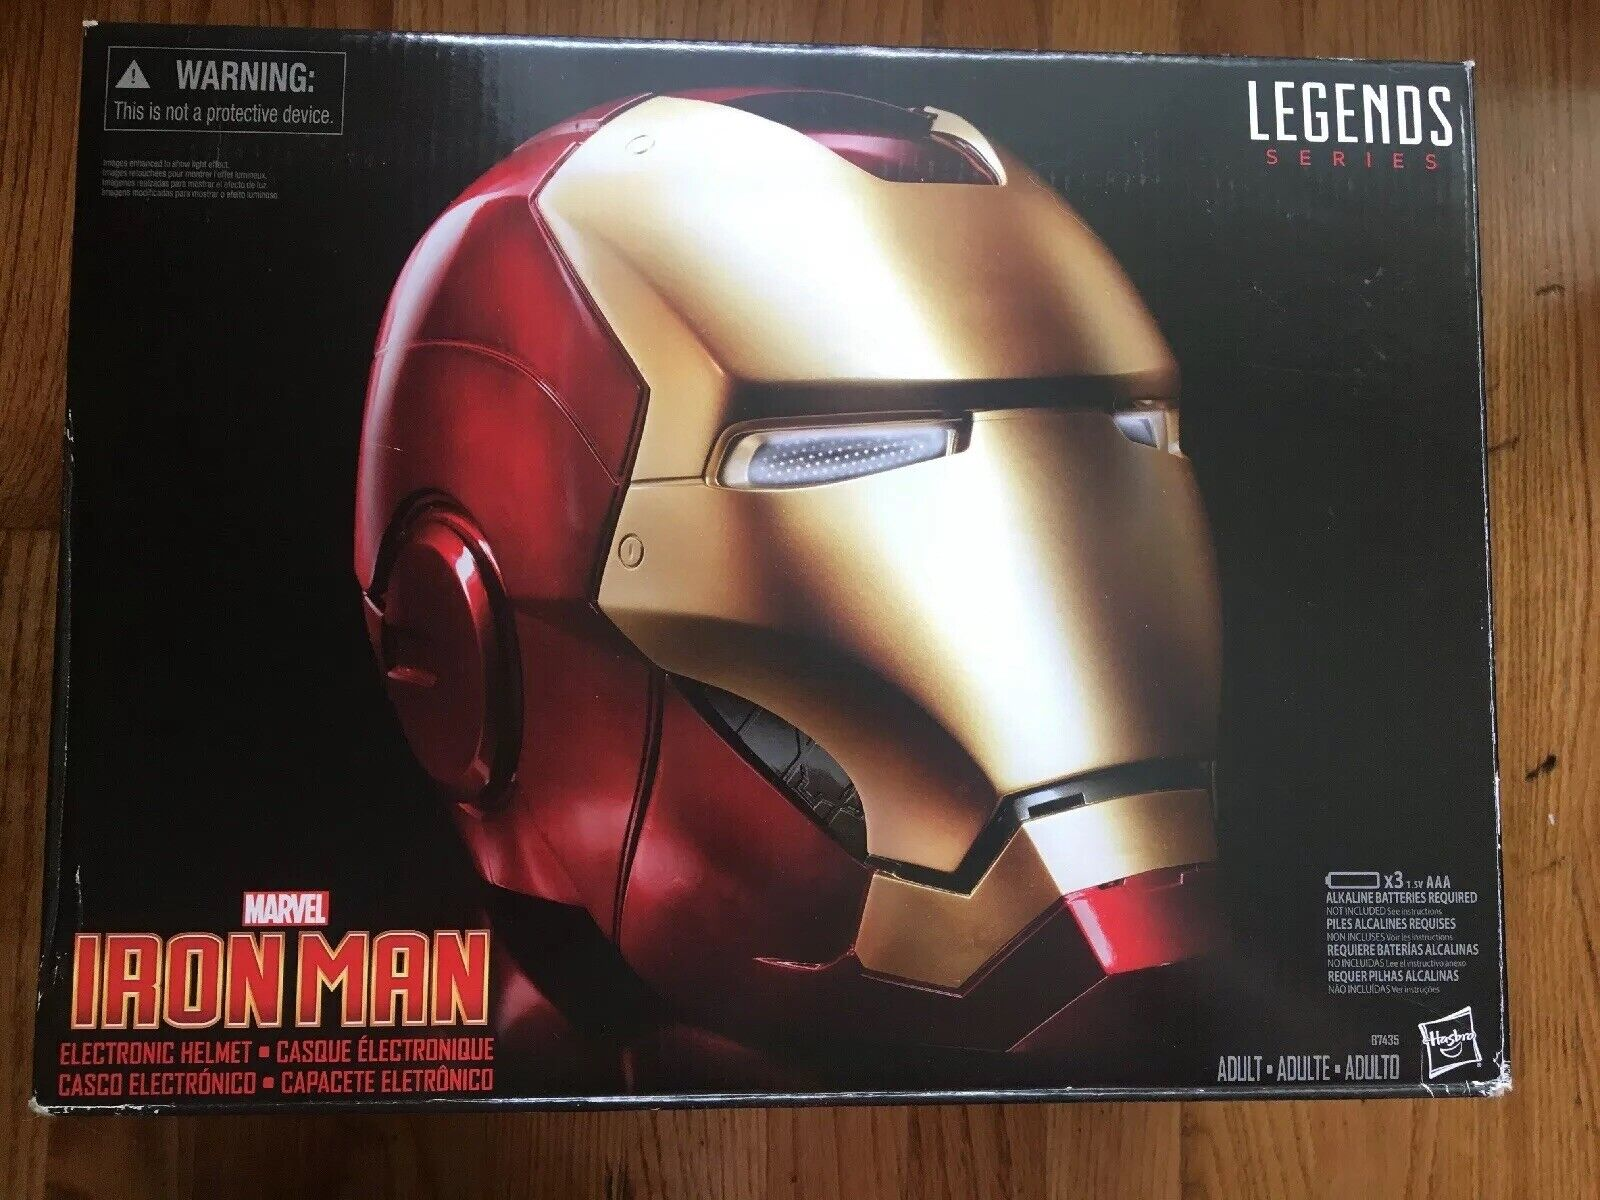 Marvel Iron Man electronic Helmet Legends  Series  populaire